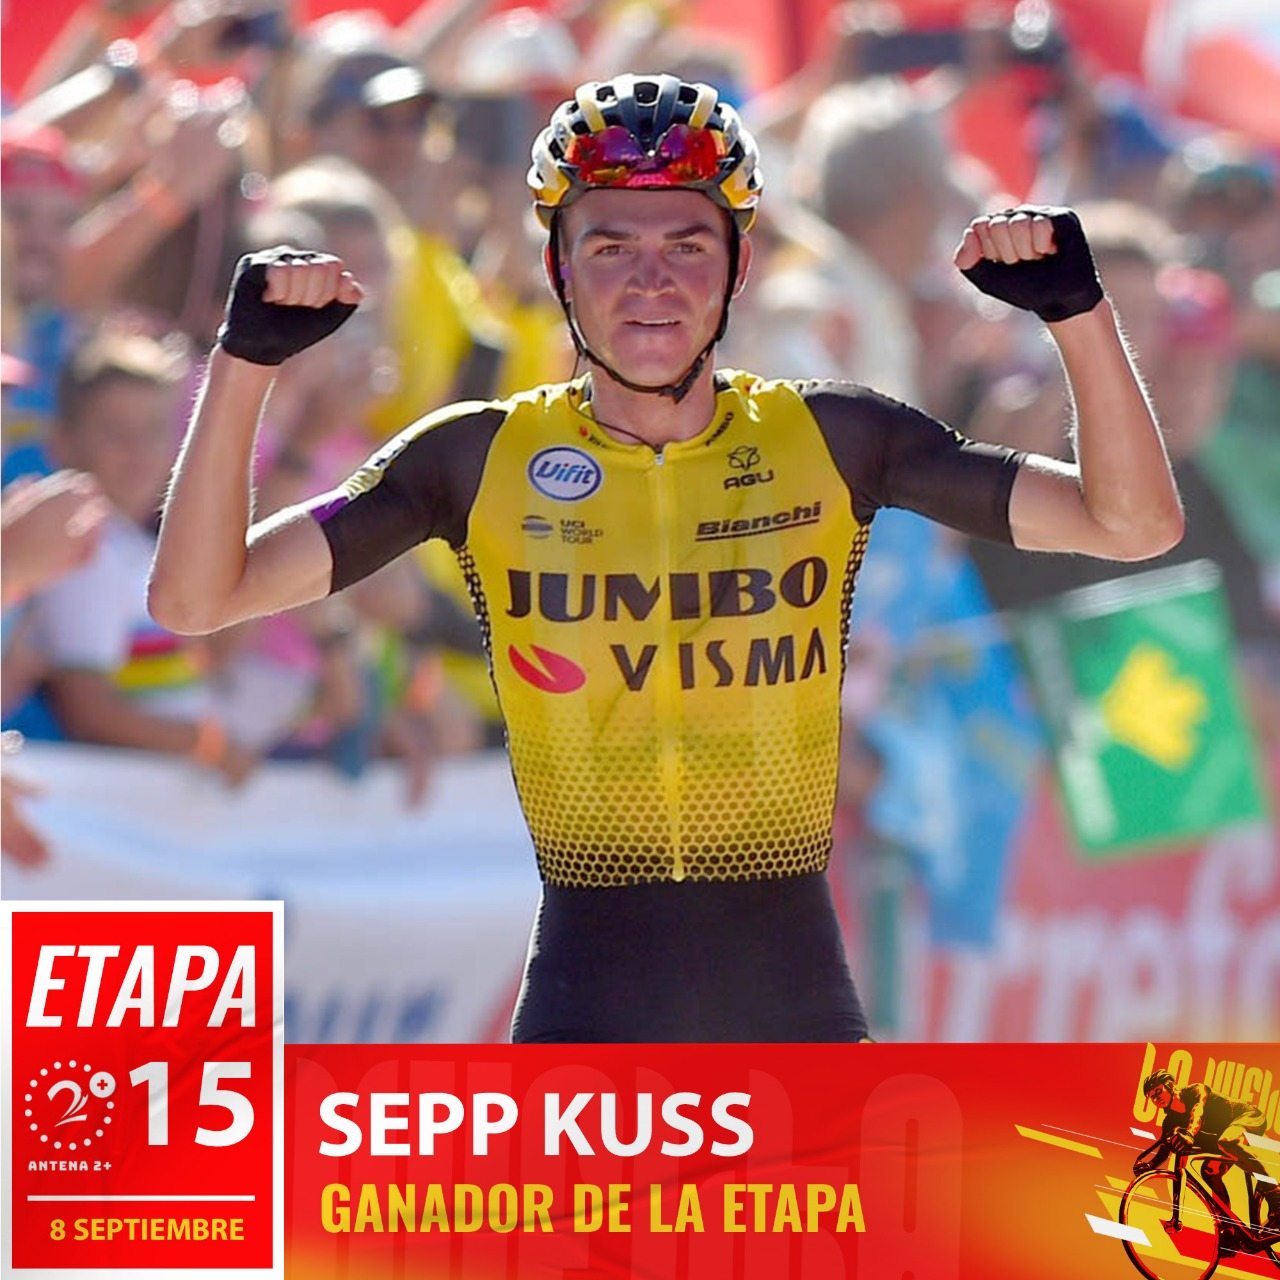 Sepp Kuss (Jumbo-Visma) ganó la etapa 15 de la Vuelta a España